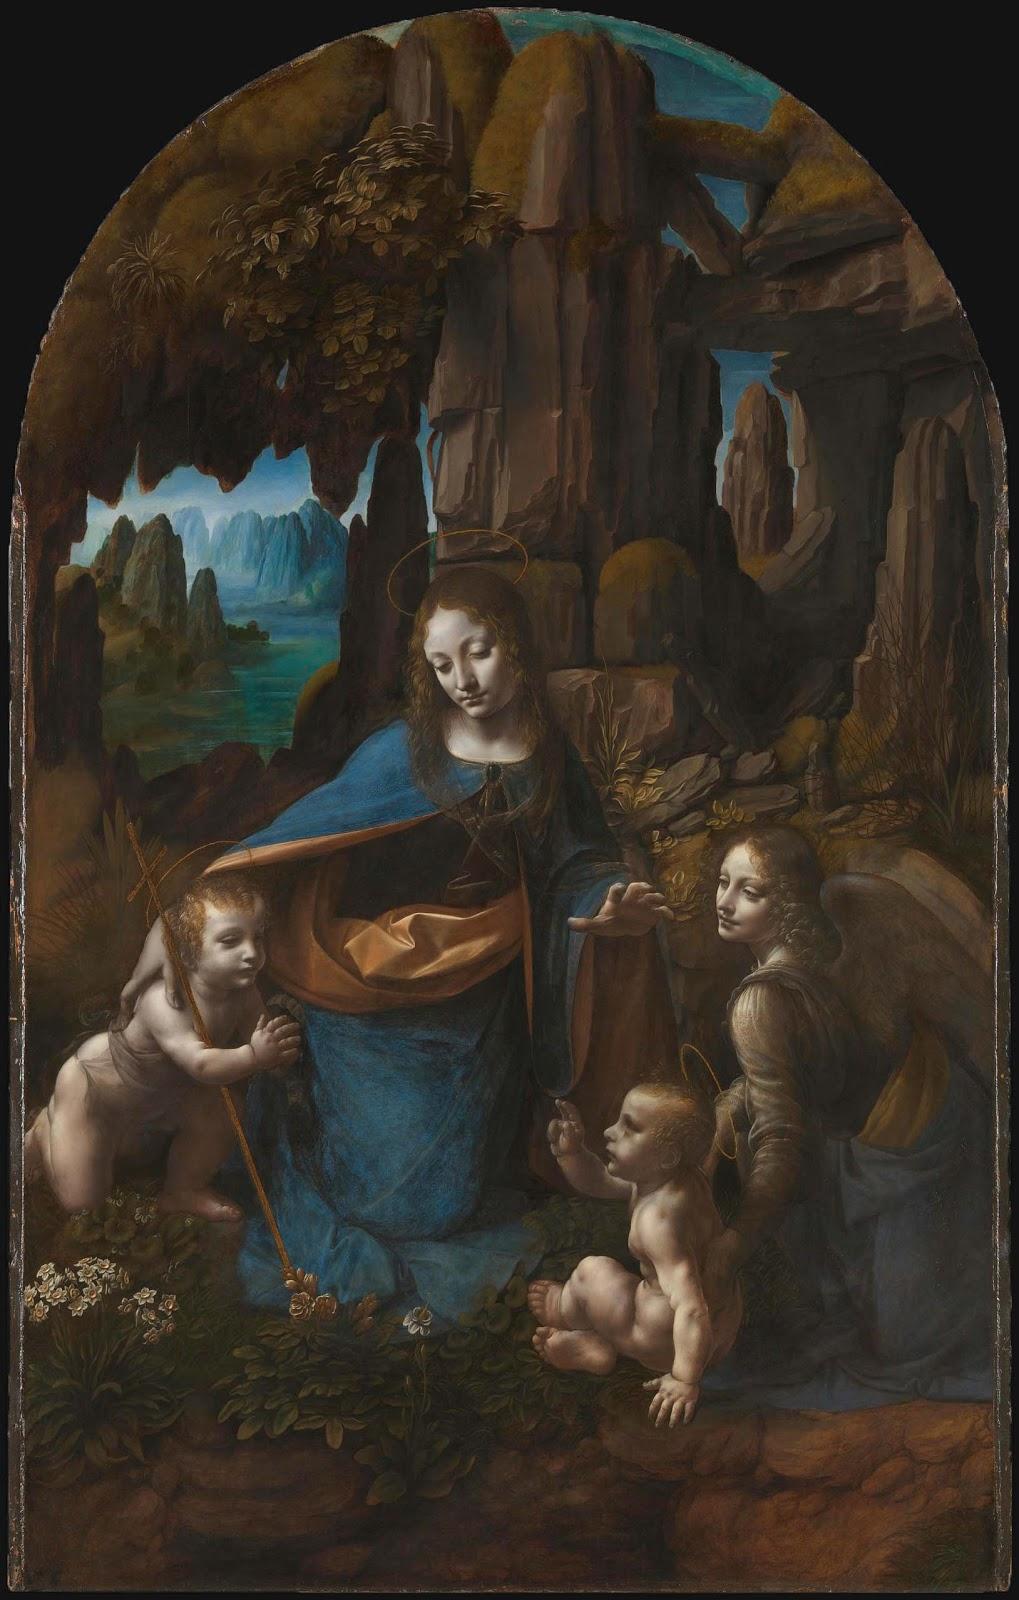 15 - Da Vinci - Virgin of the Rocks